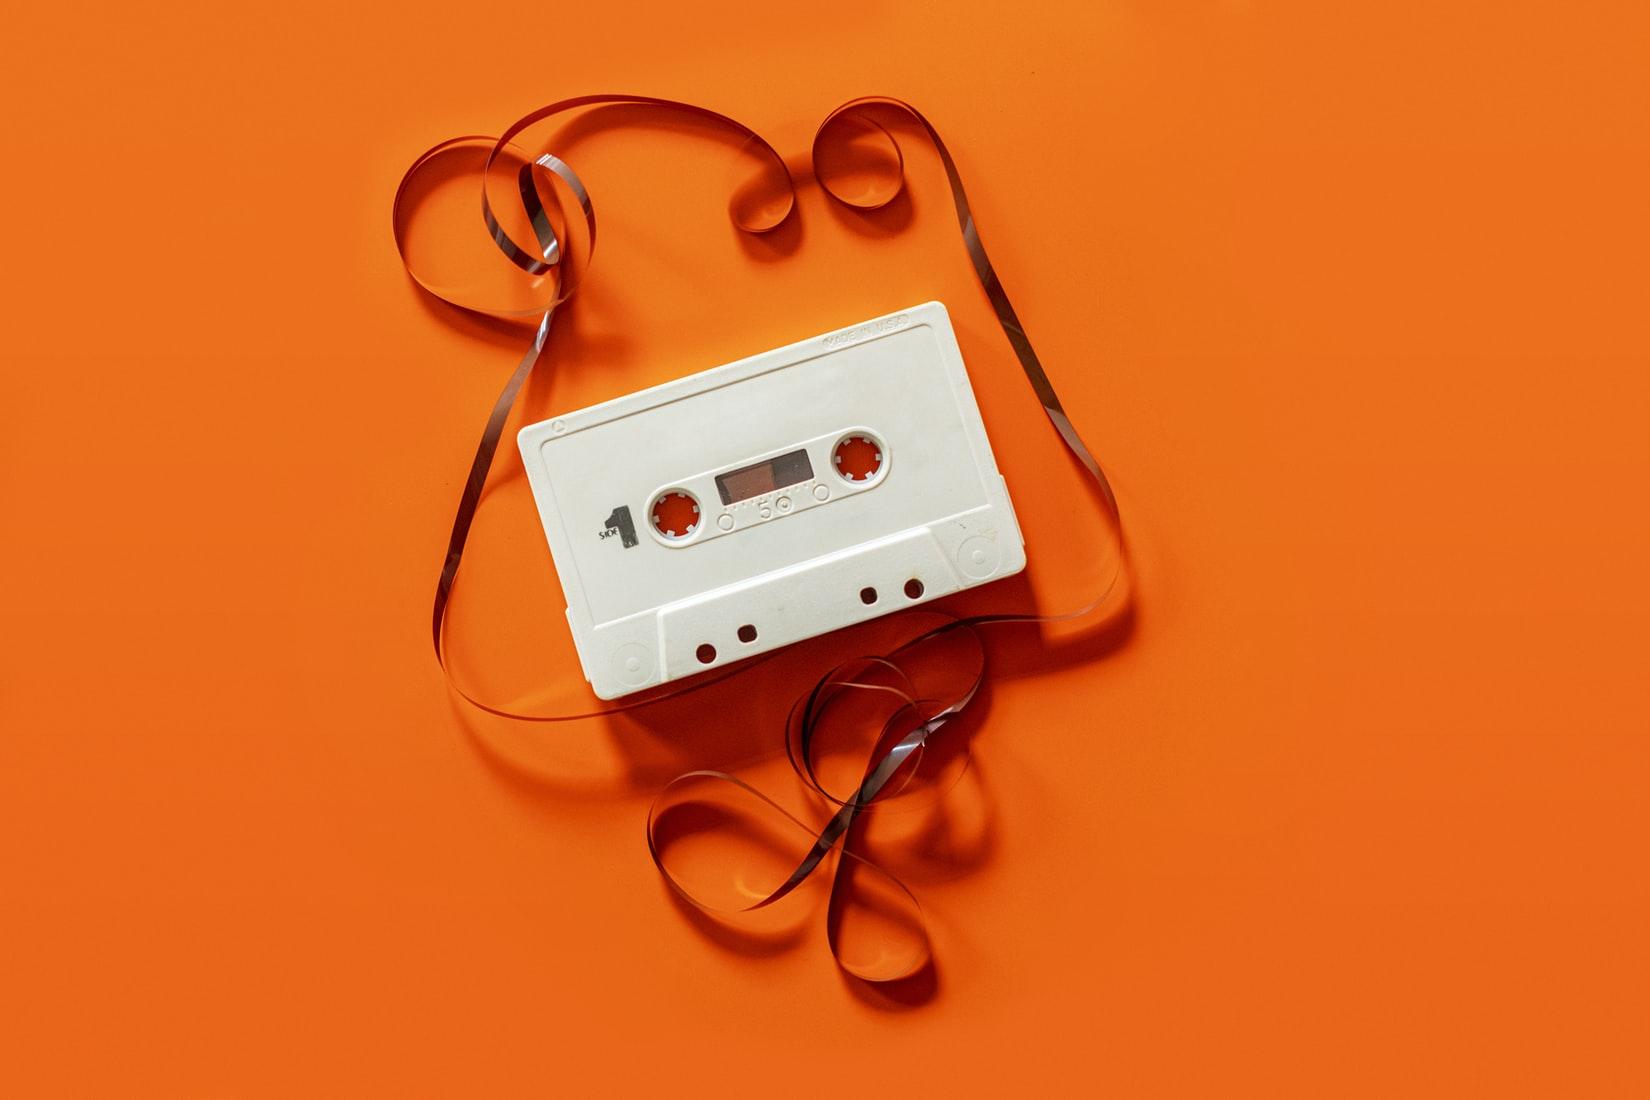 orange background with white cassette tape